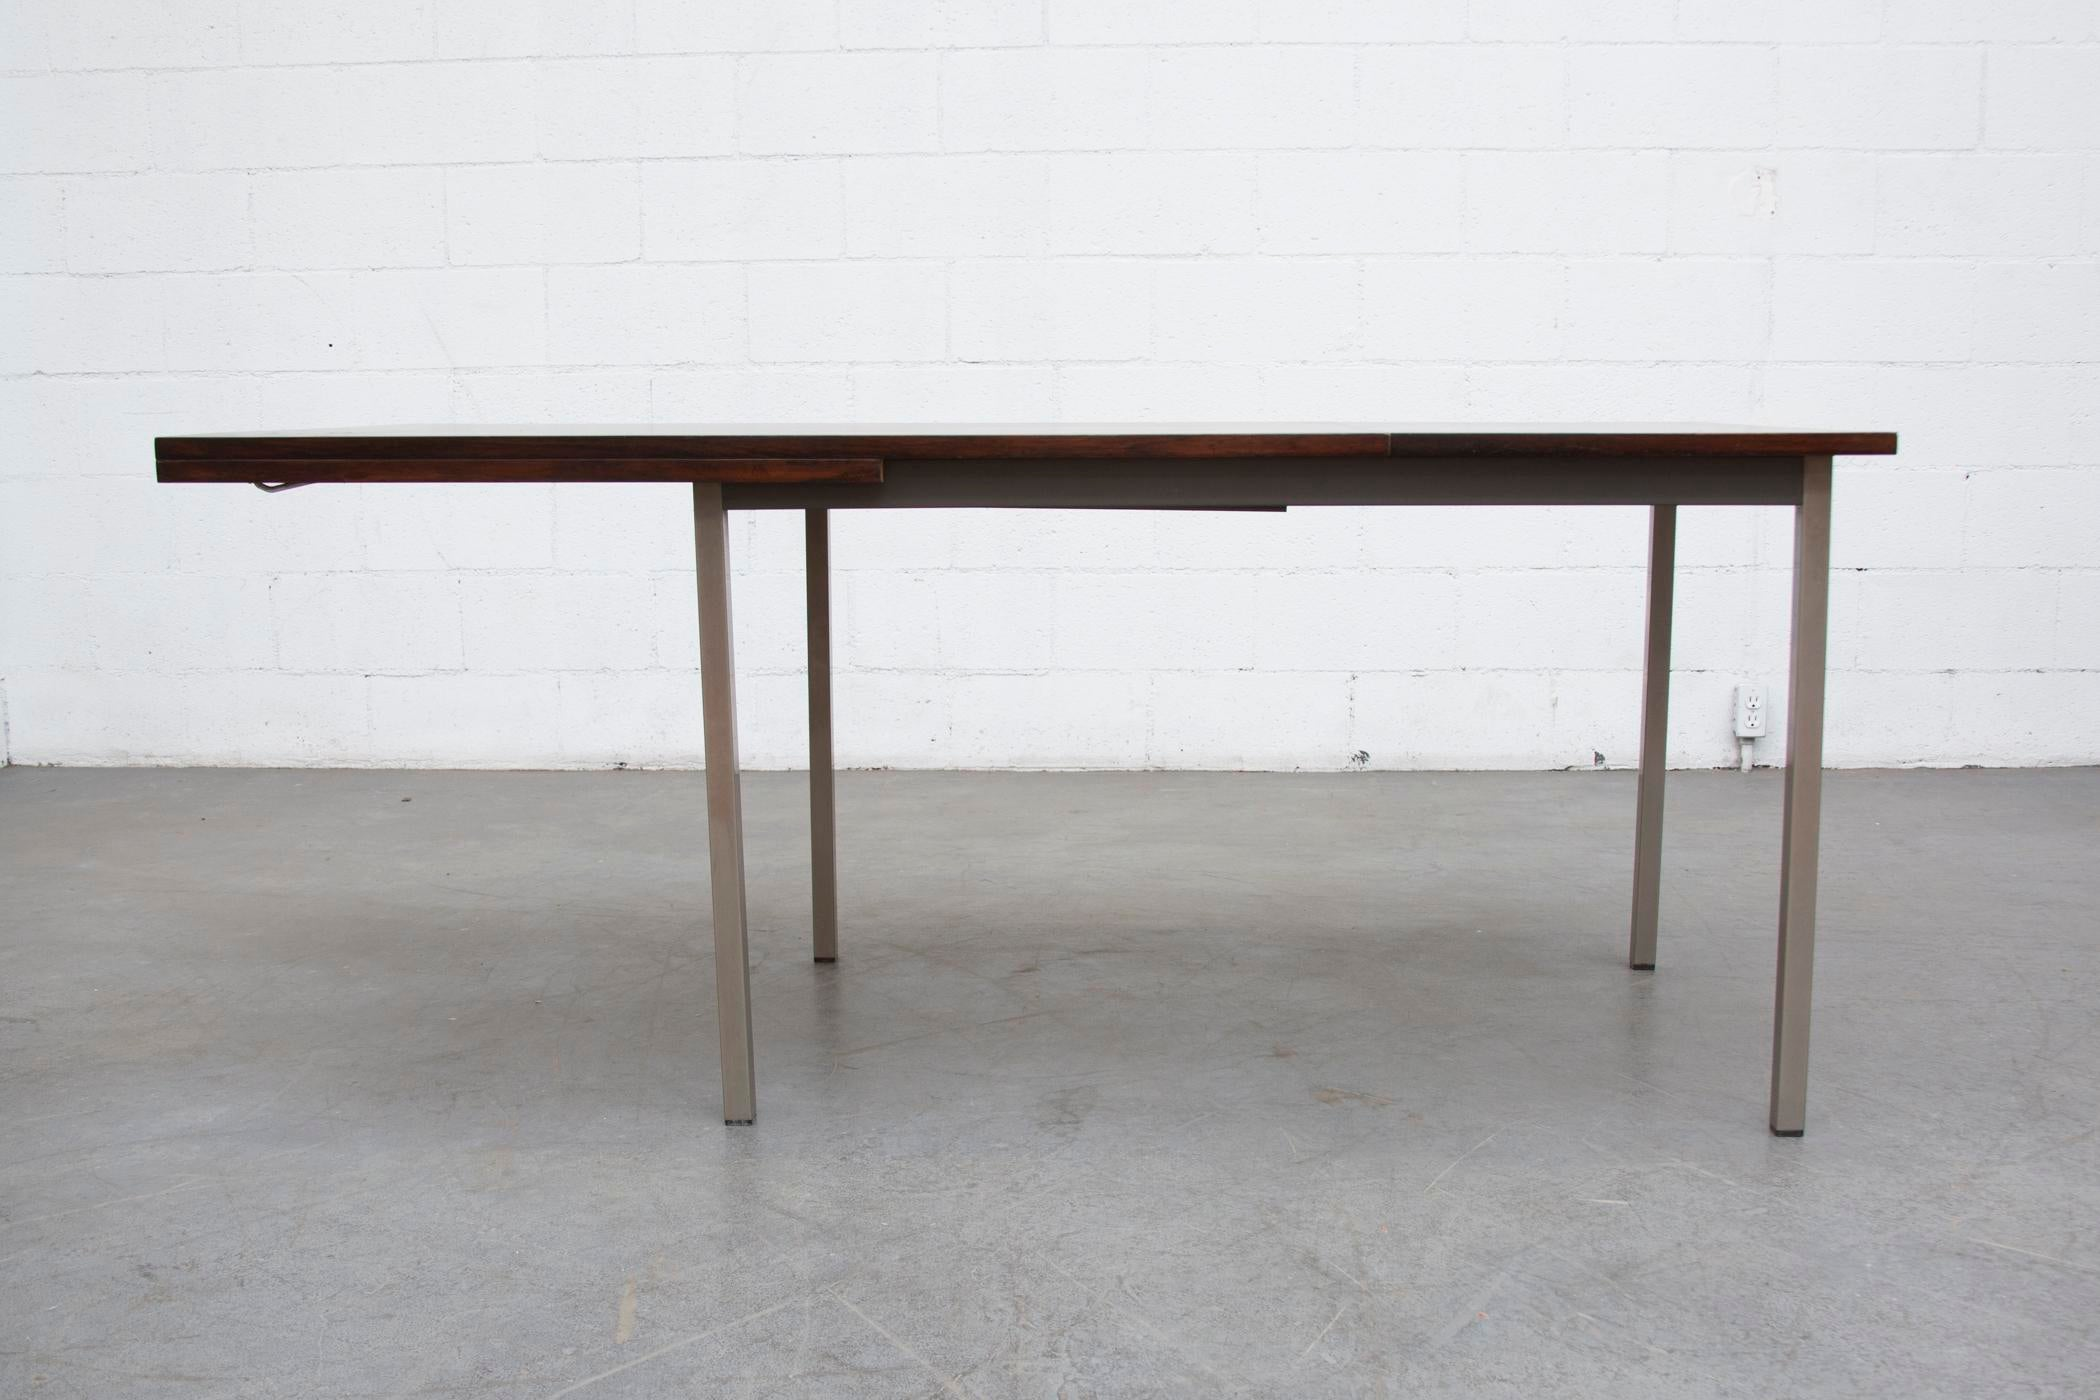 Rosewood Industrial Style Dining Table Chairish : 28b1988c 41ef 4b3b 9238 ff7a4b435d64aspectfitampwidth640ampheight640 from www.chairish.com size 640 x 640 jpeg 26kB